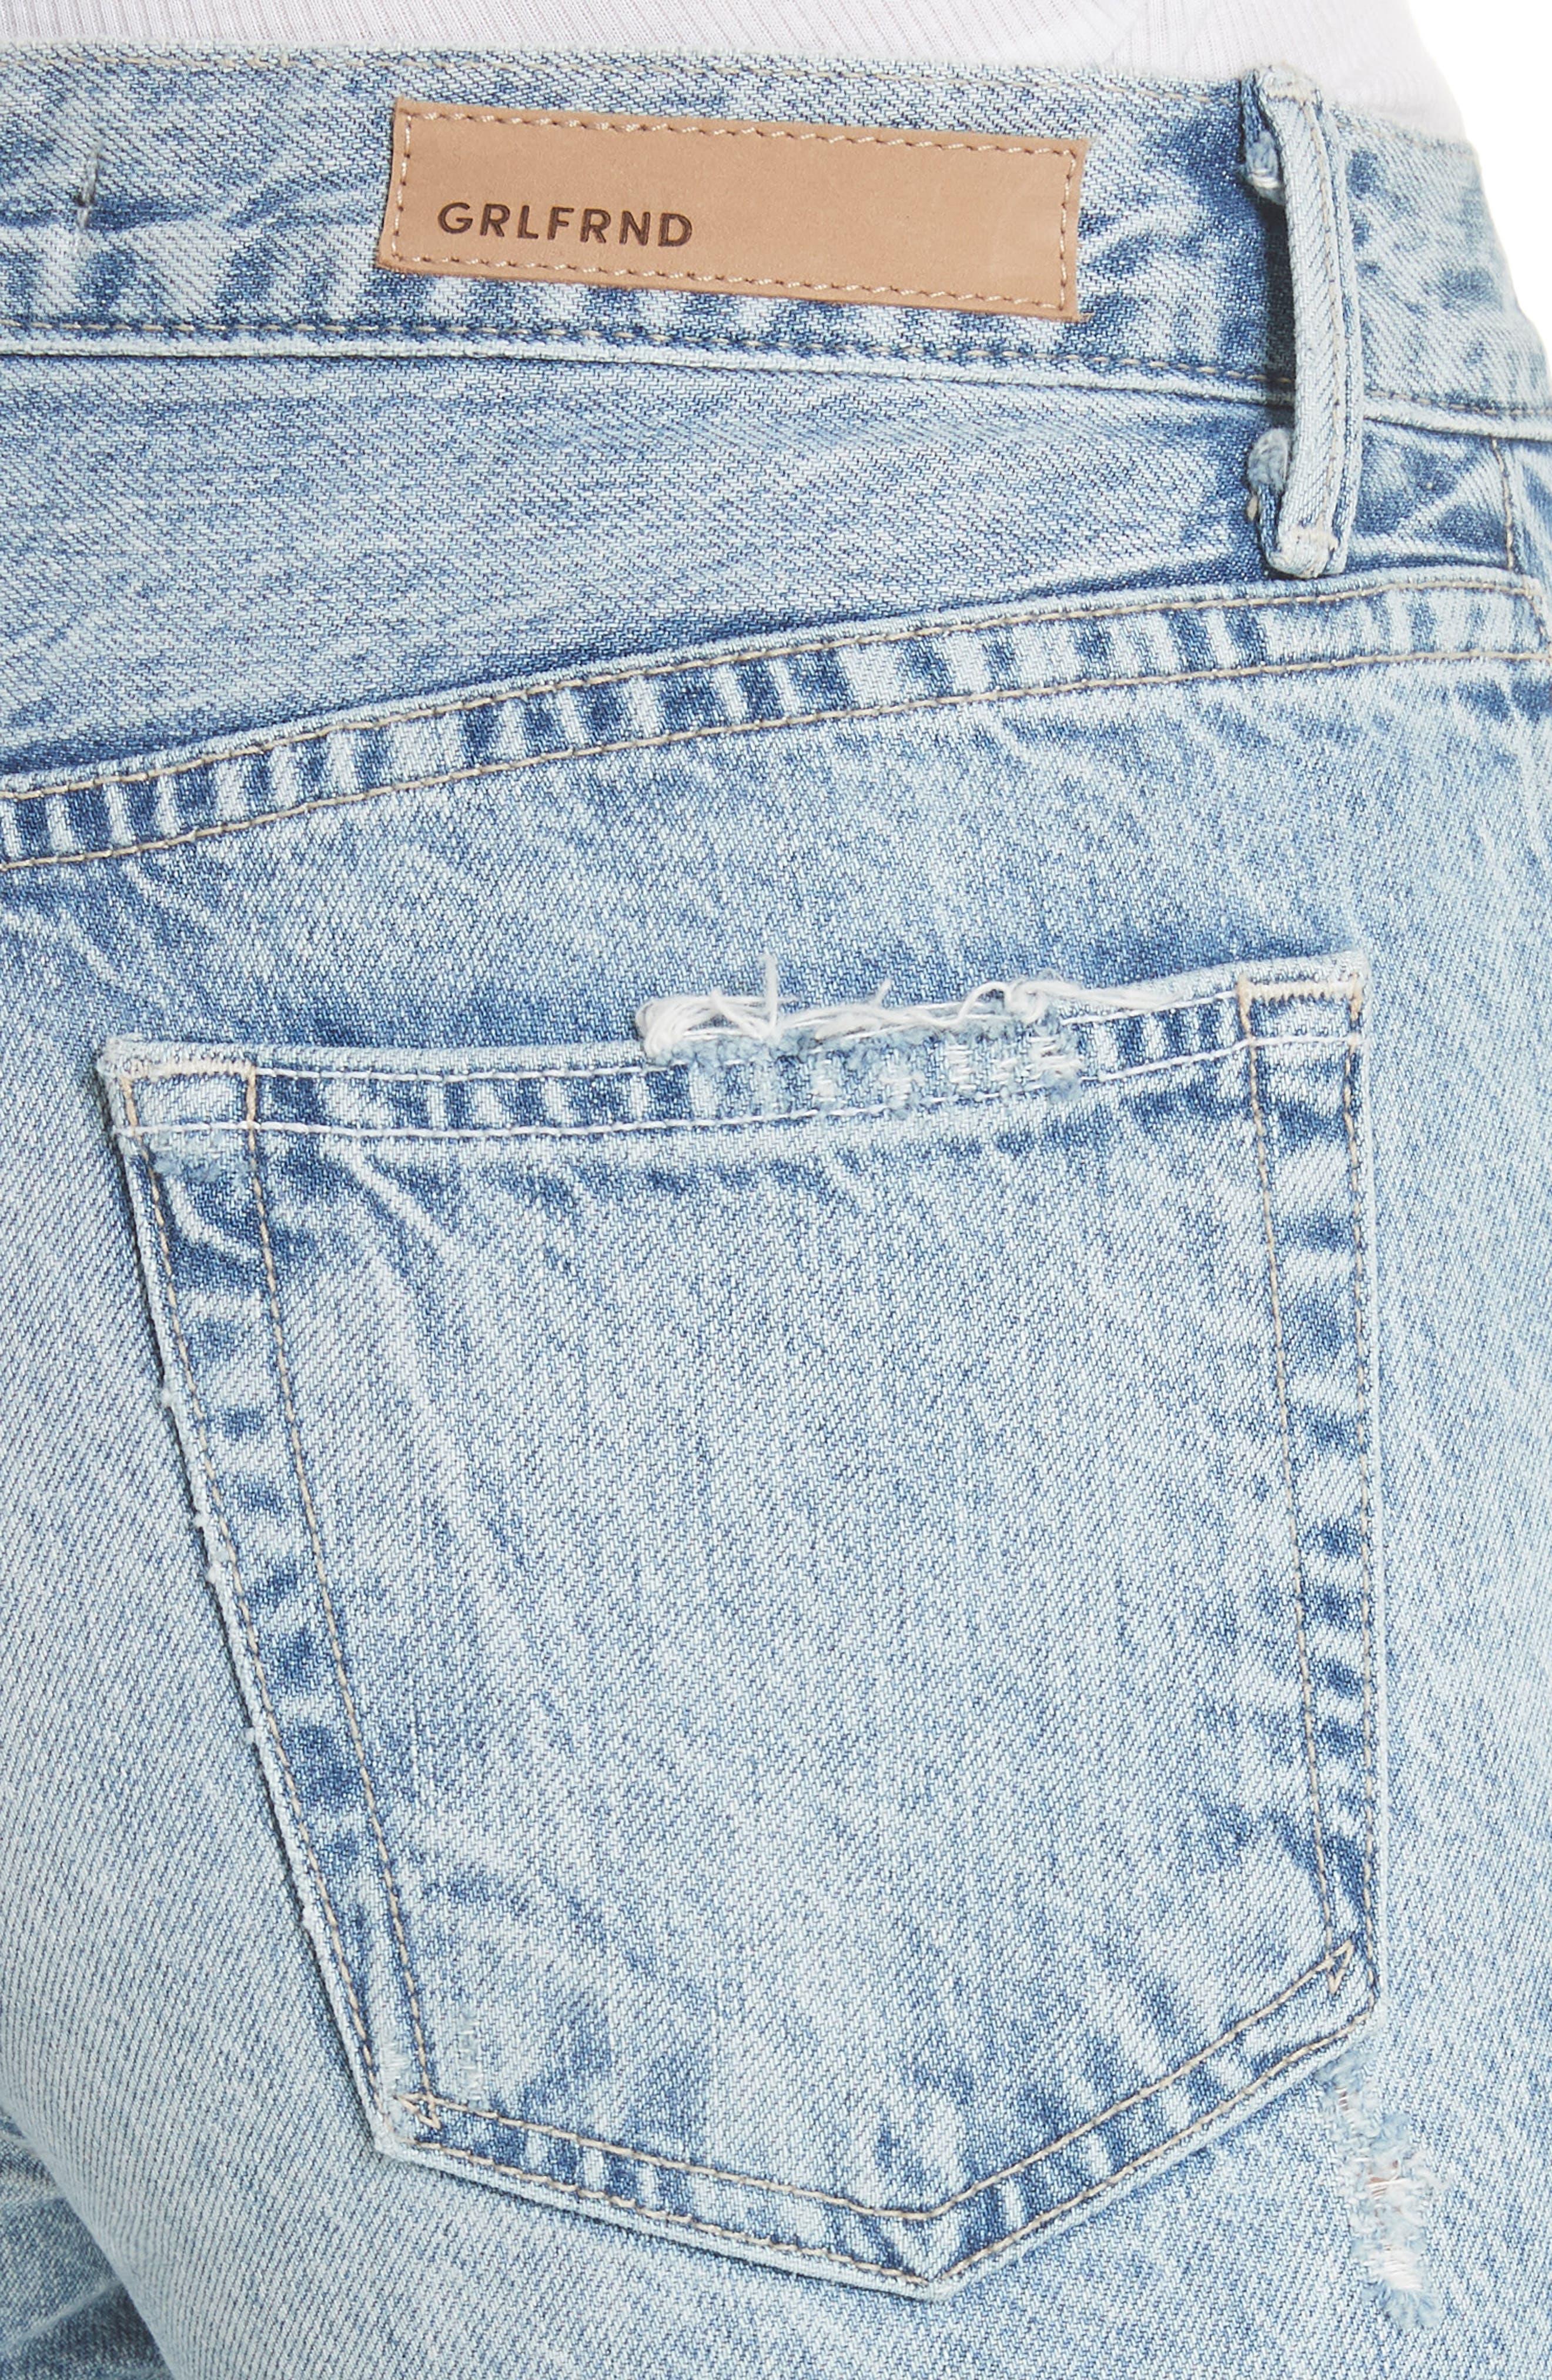 GRLFRND, Helena Frayed Hem High Waist Jeans, Alternate thumbnail 5, color, 401